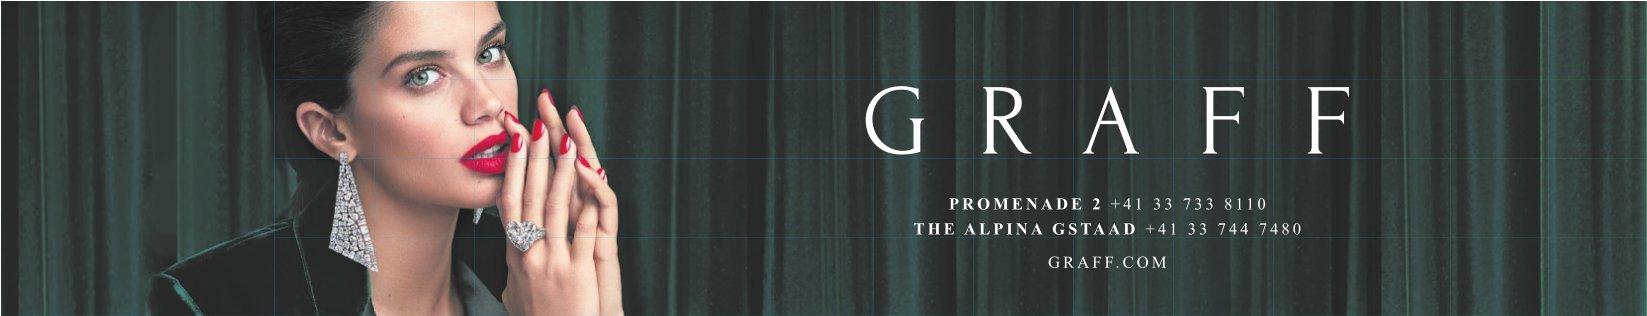 GRAFF - THE ALPINA GSTAAD